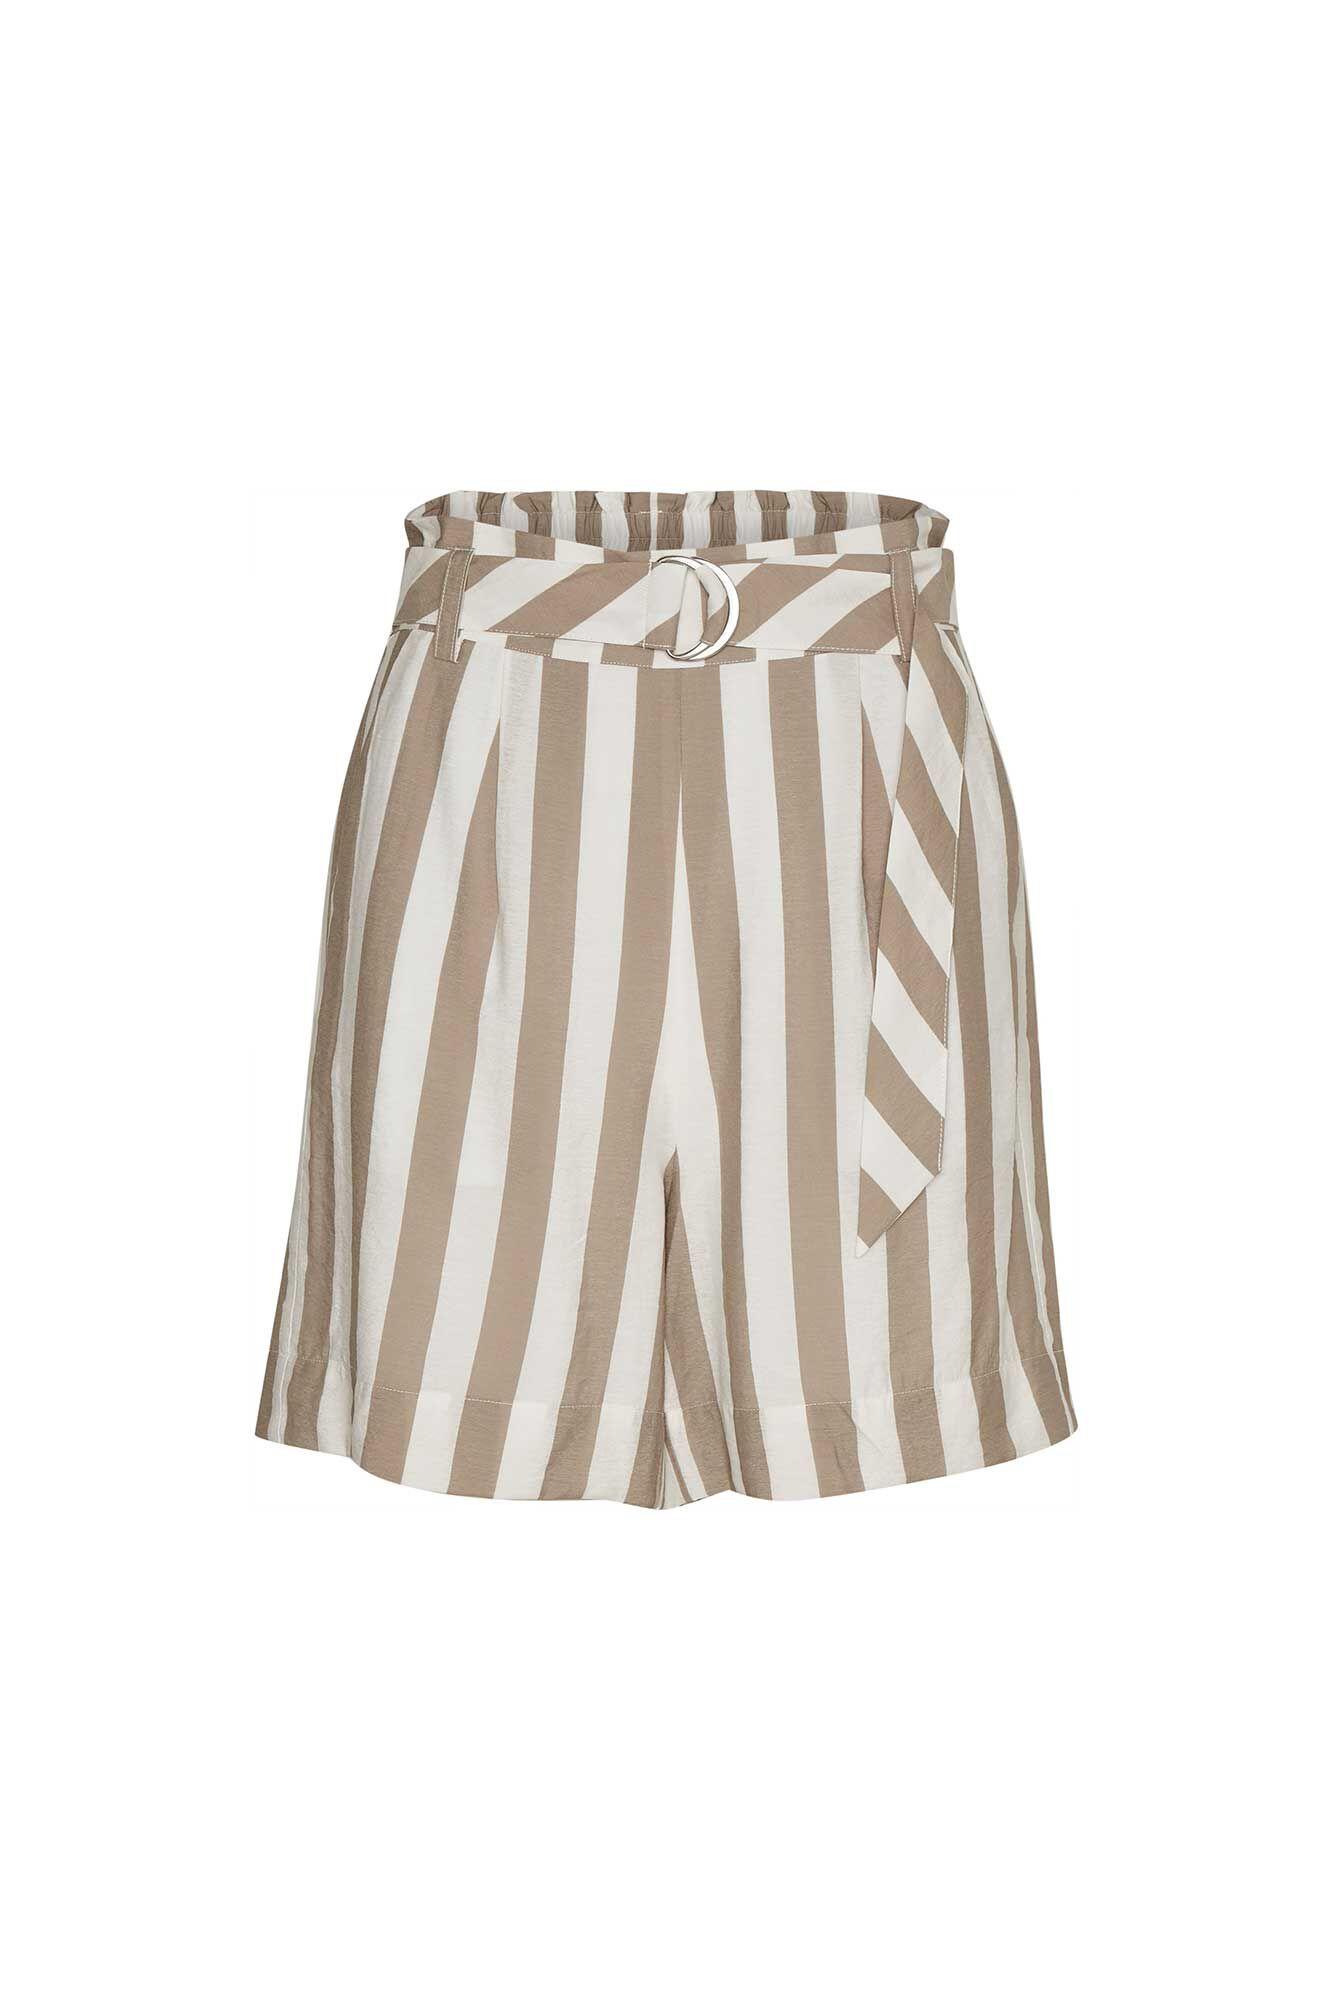 Gunnagz shorts 10903352, SAND STRIPE